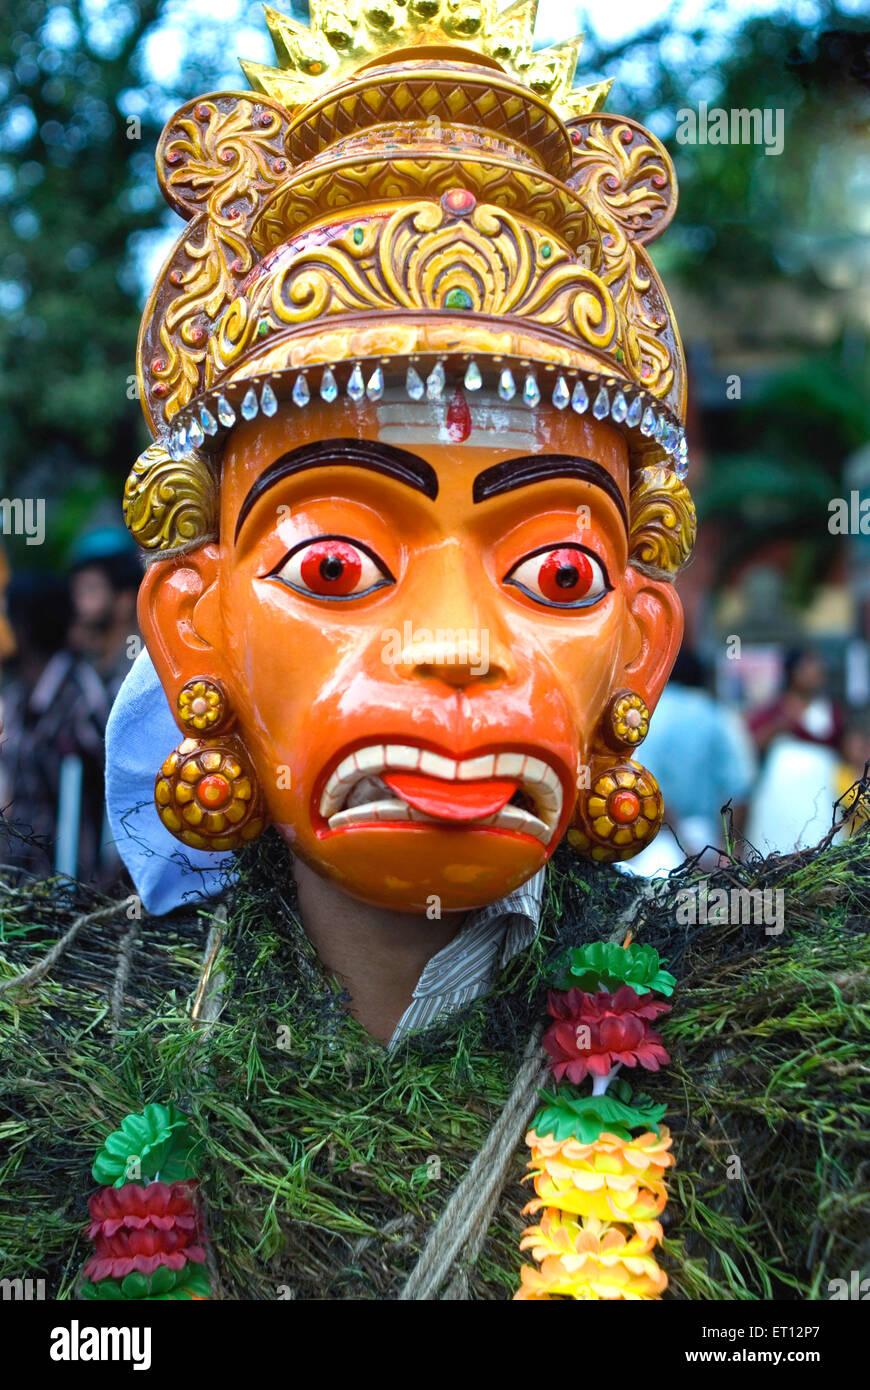 Kummattikali folk art hanuman mask performer during onam celebration ; Trivandrum ; Kerala ; India 2008 - Stock Image